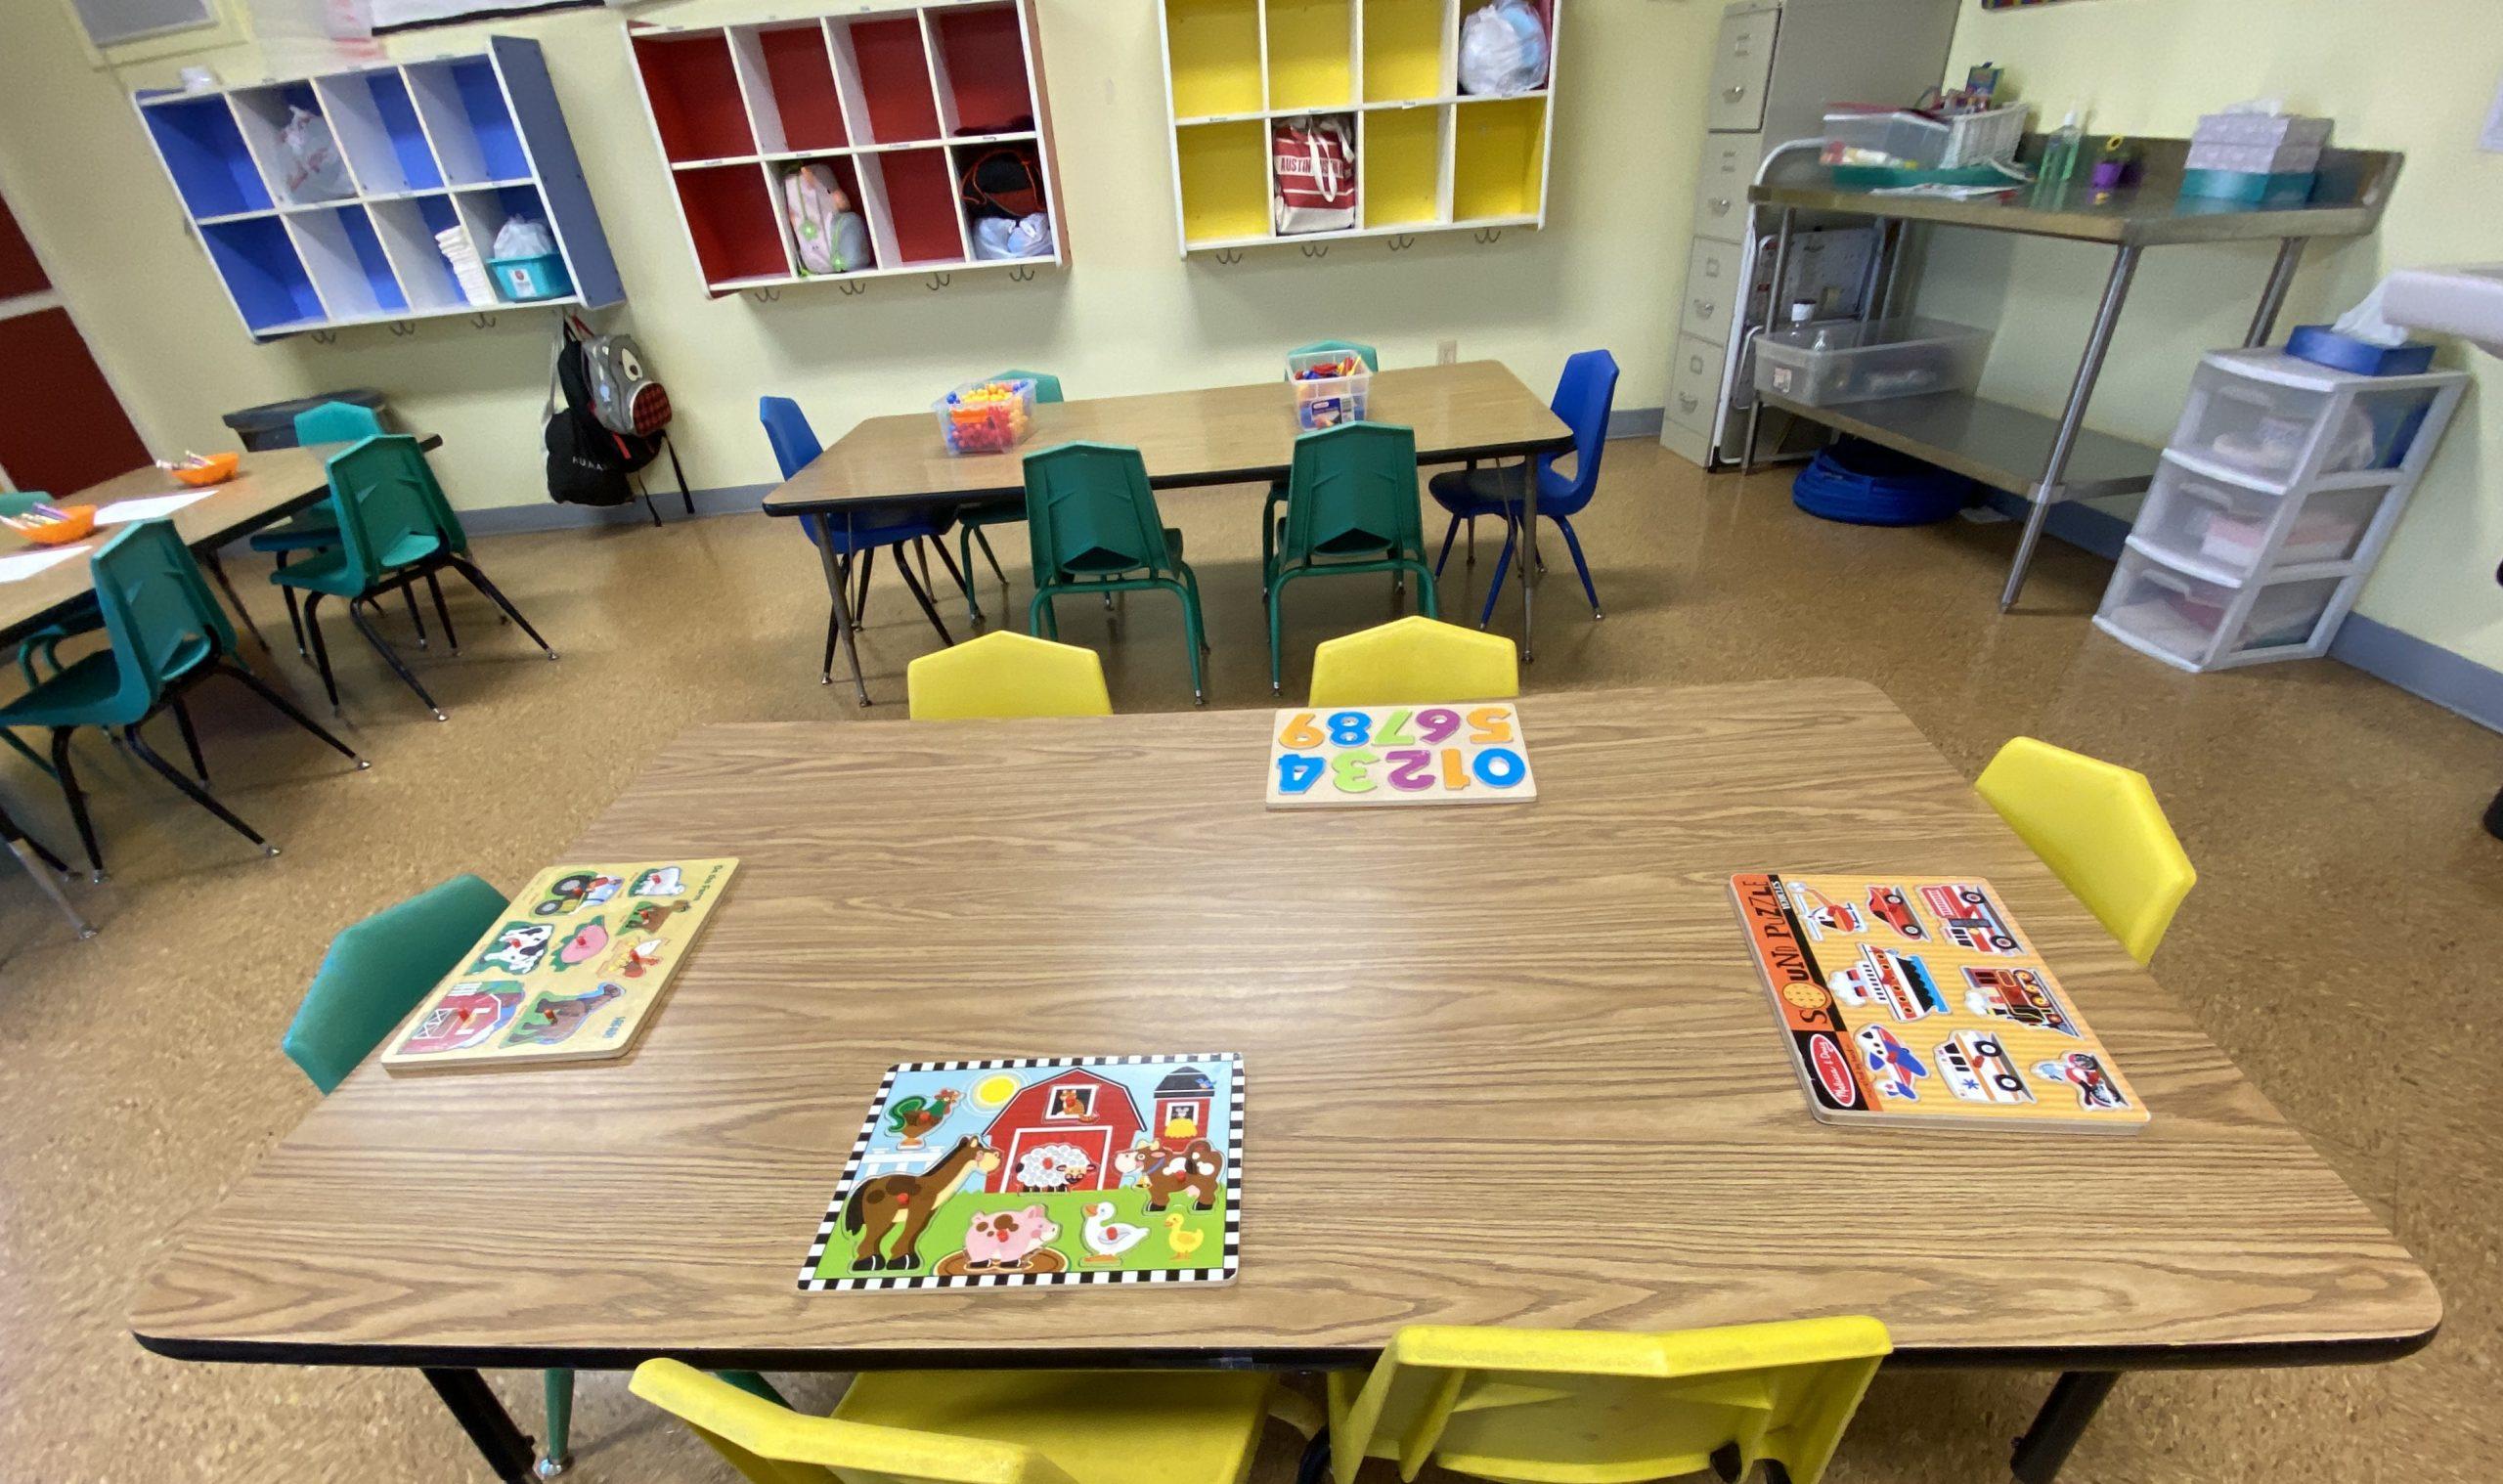 Daycare, Preschool puzzles